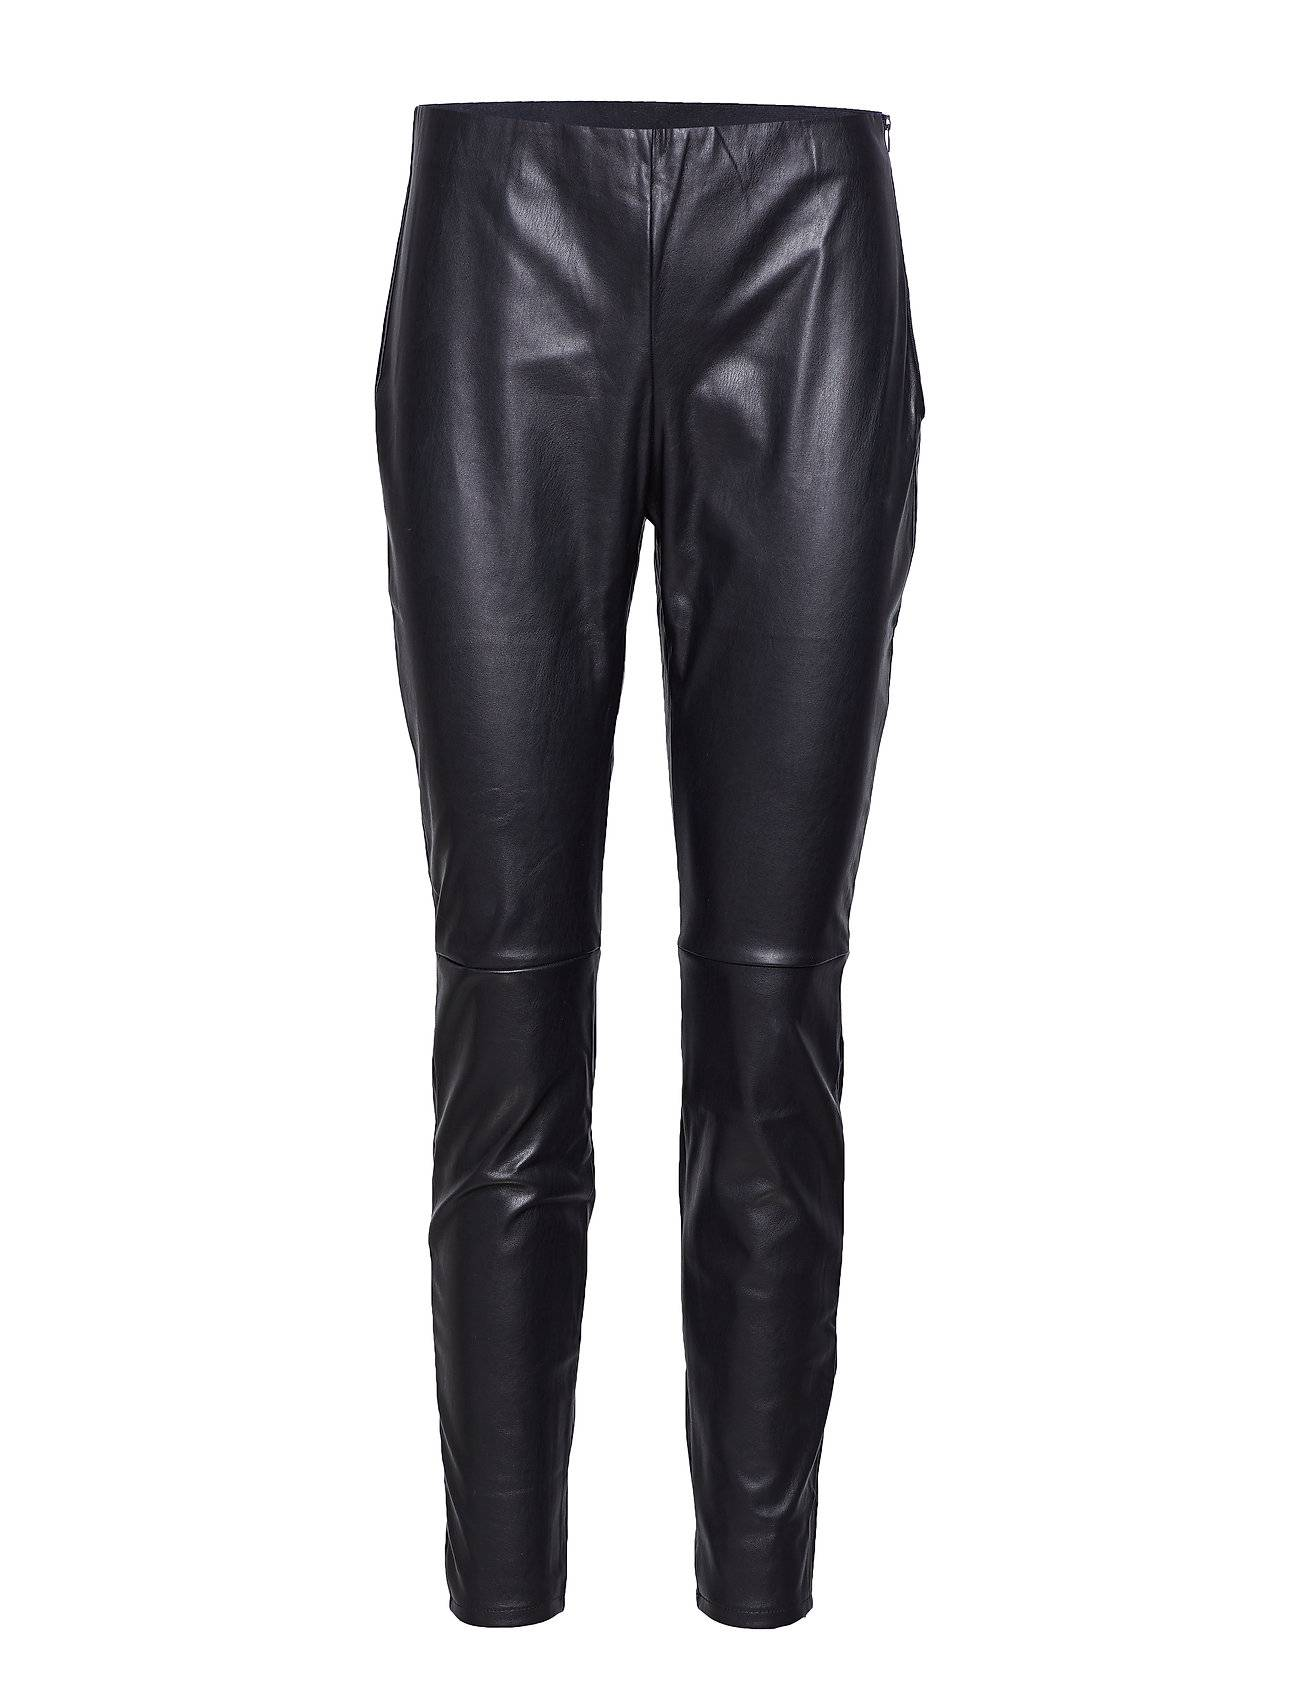 Twist & Tango Arleen Trousers Leather Leggings/Housut Musta Twist & Tango